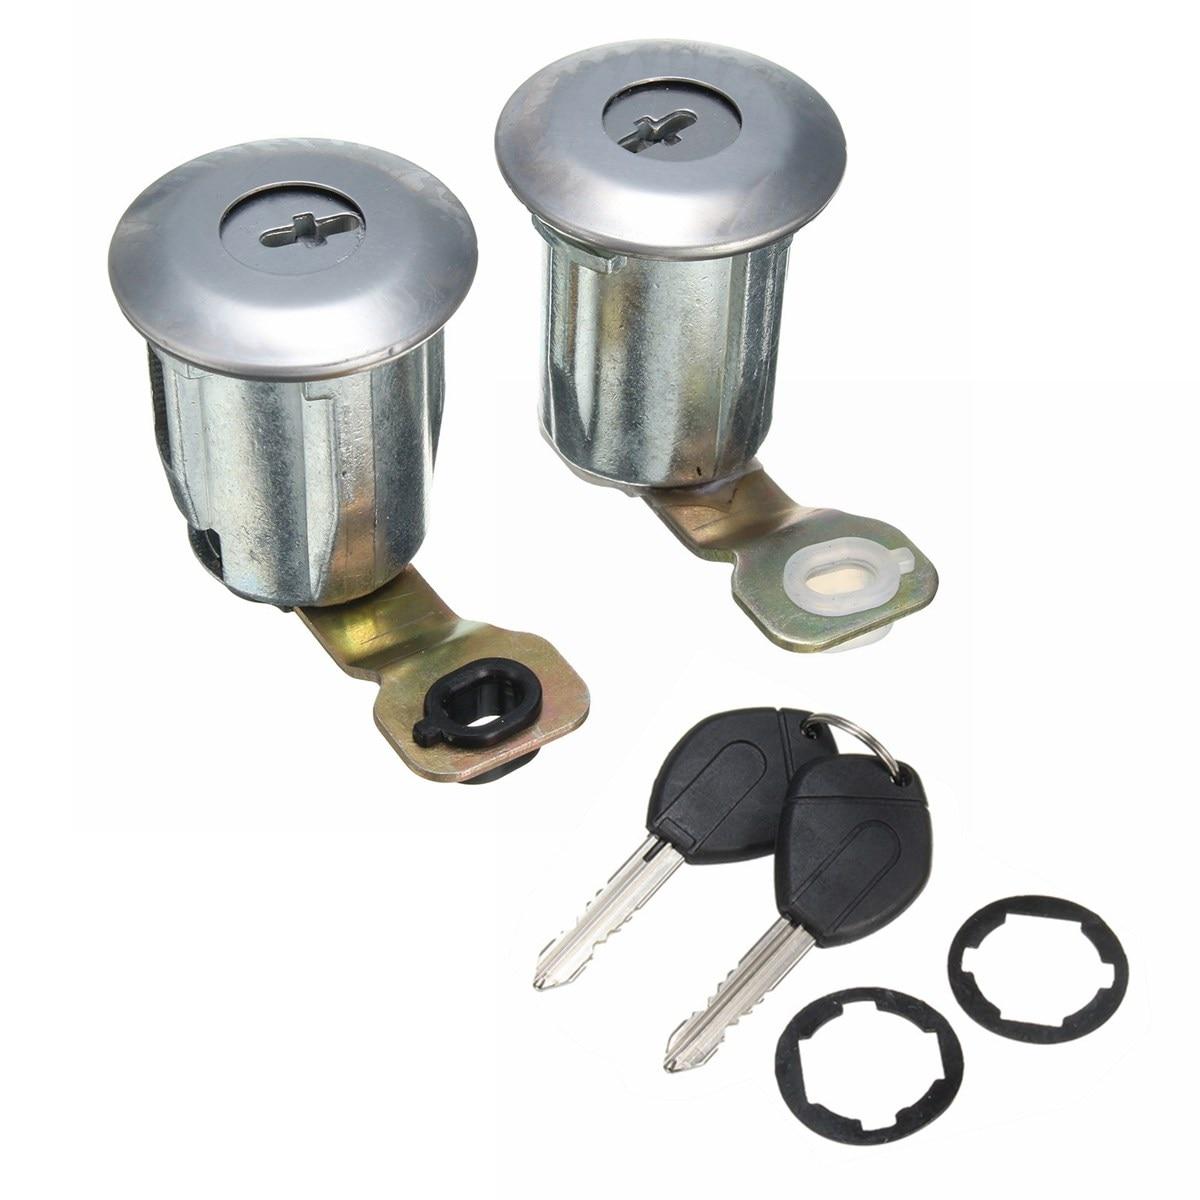 Lot of 10 Door Lock Cylinder Covers Chrome Cap Car Truck Fits Most 62-355